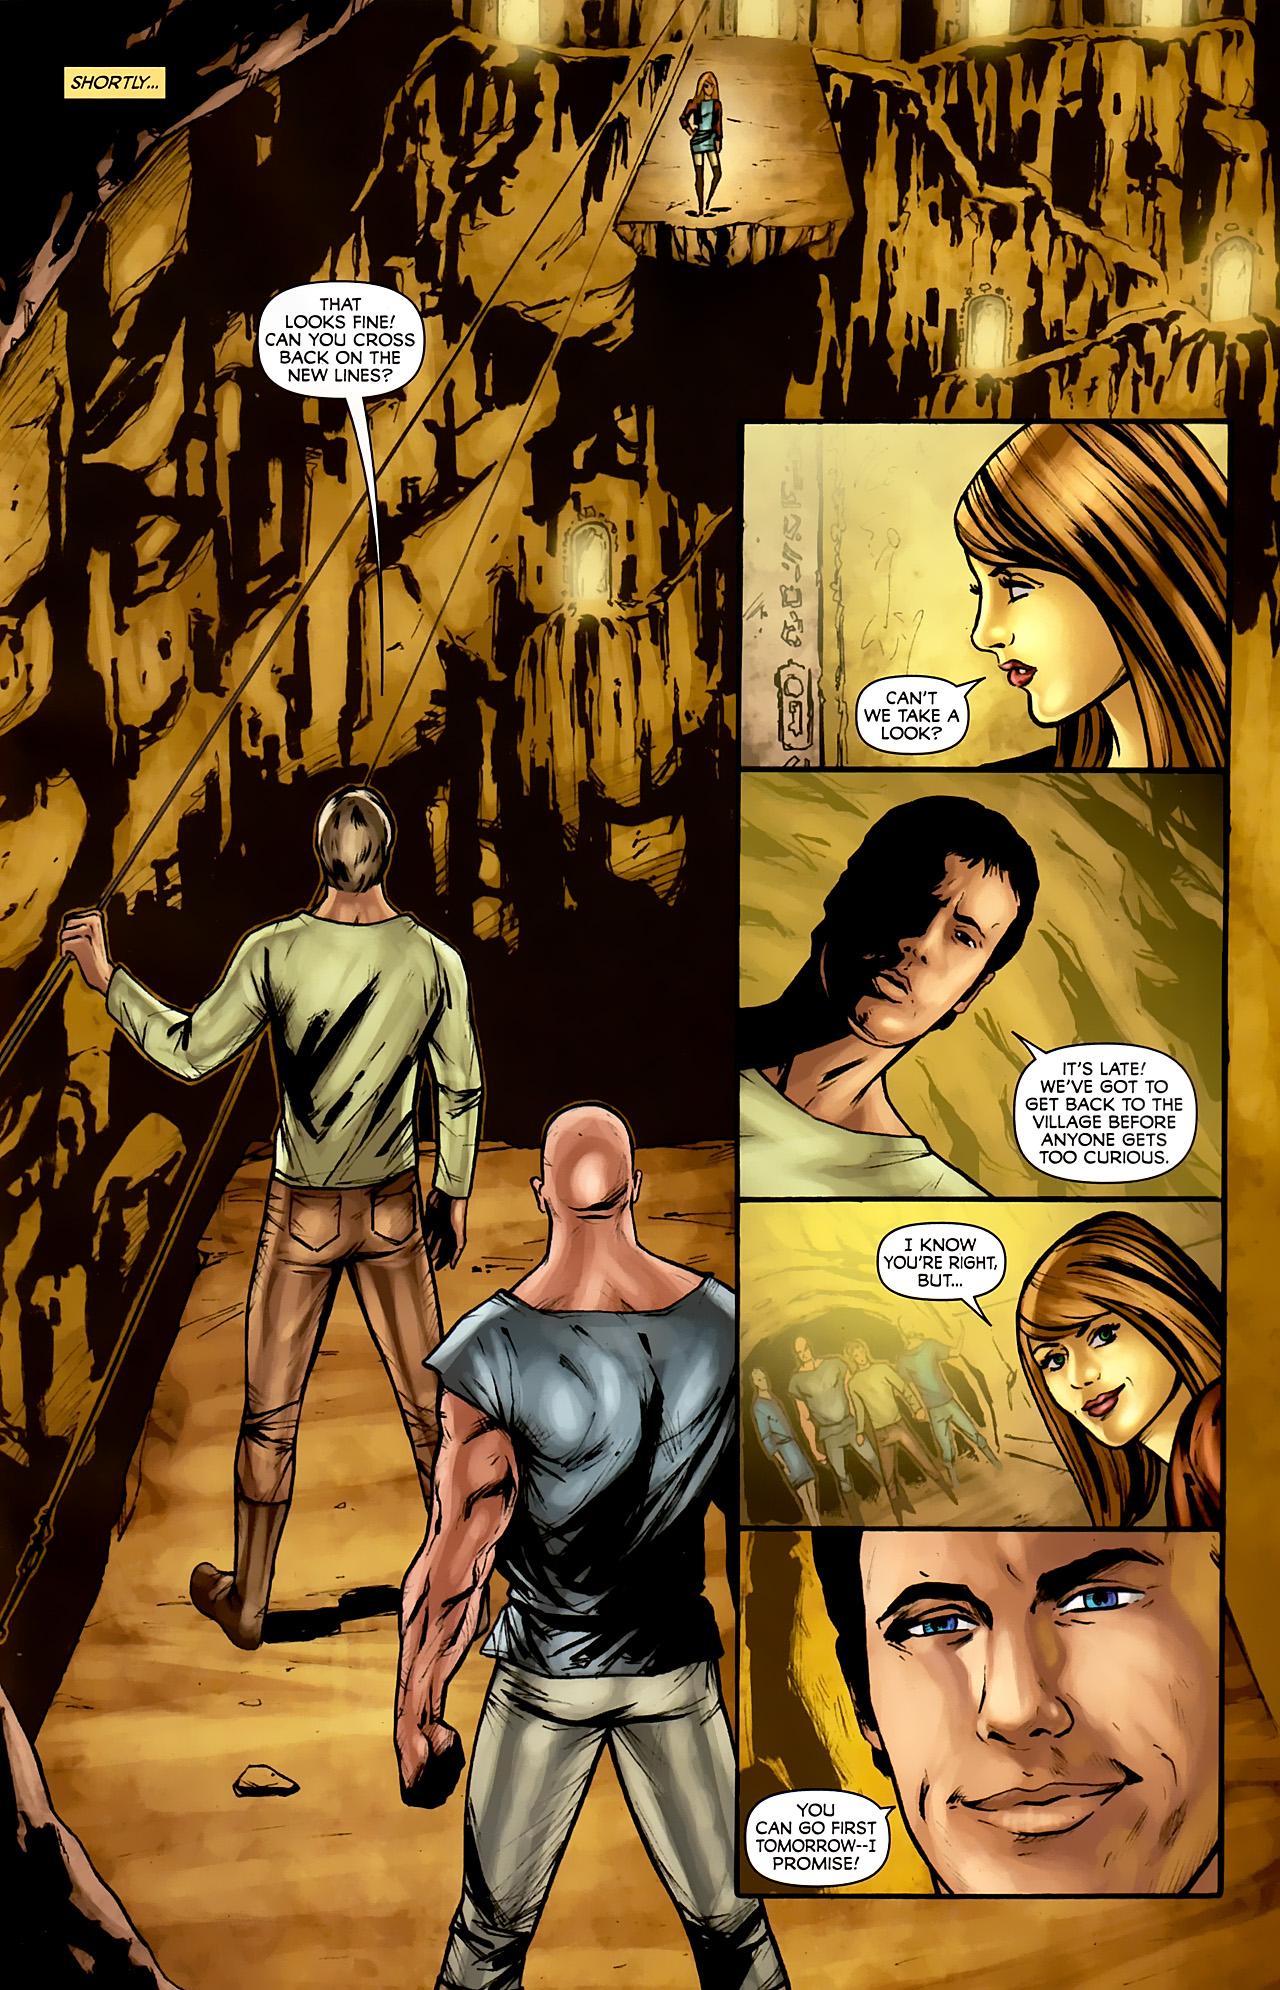 Read online Stargate: Daniel Jackson comic -  Issue #3 - 17